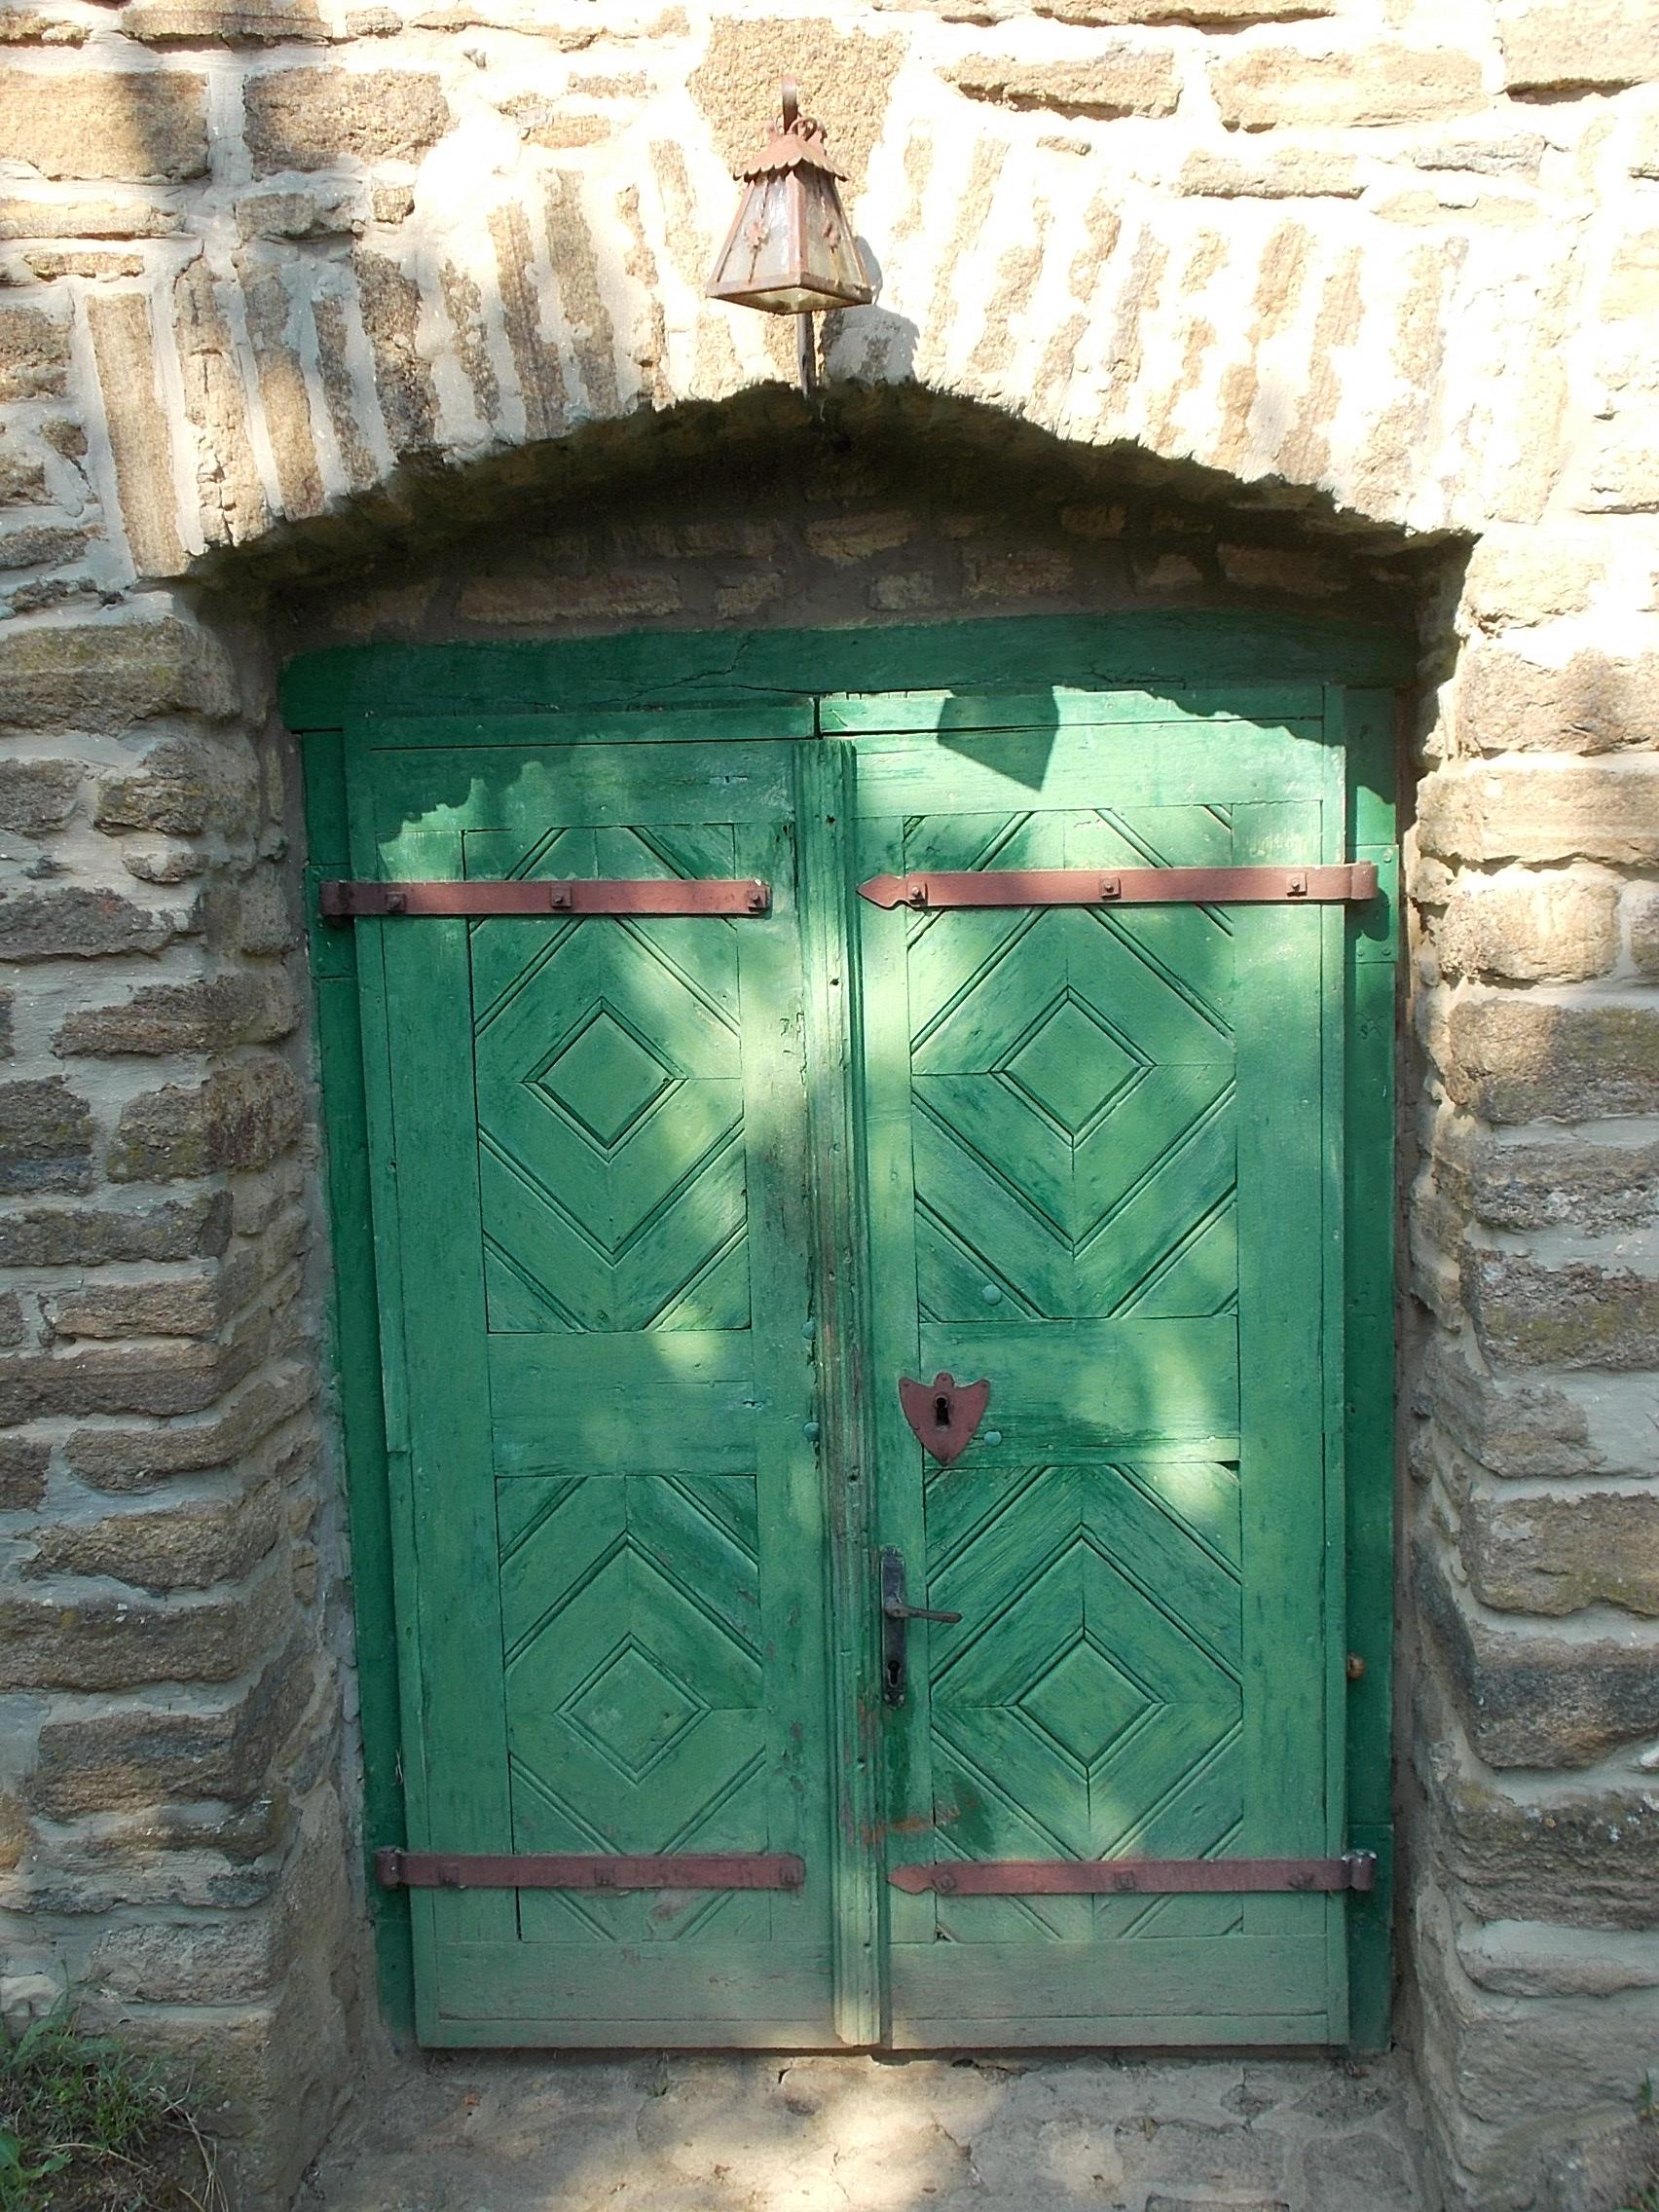 FileOld Wine Cellar (door). - Kiserdőtelepi Rd. Tihany & File:Old Wine Cellar (door). - Kiserdőtelepi Rd. Tihany Hungary ...